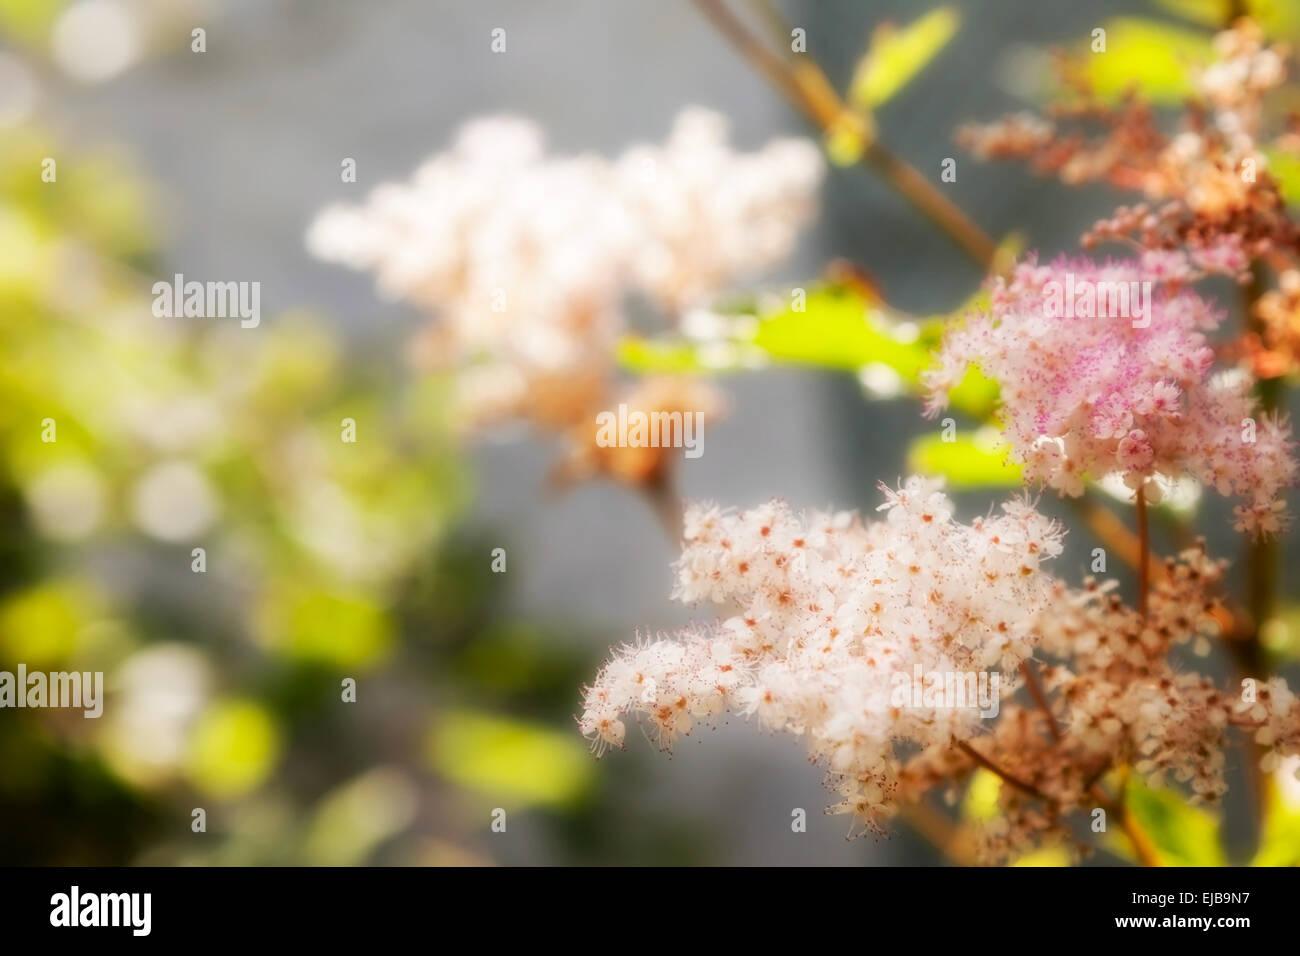 Frühling Blumen Spirea. im Freien Schuss Stockbild